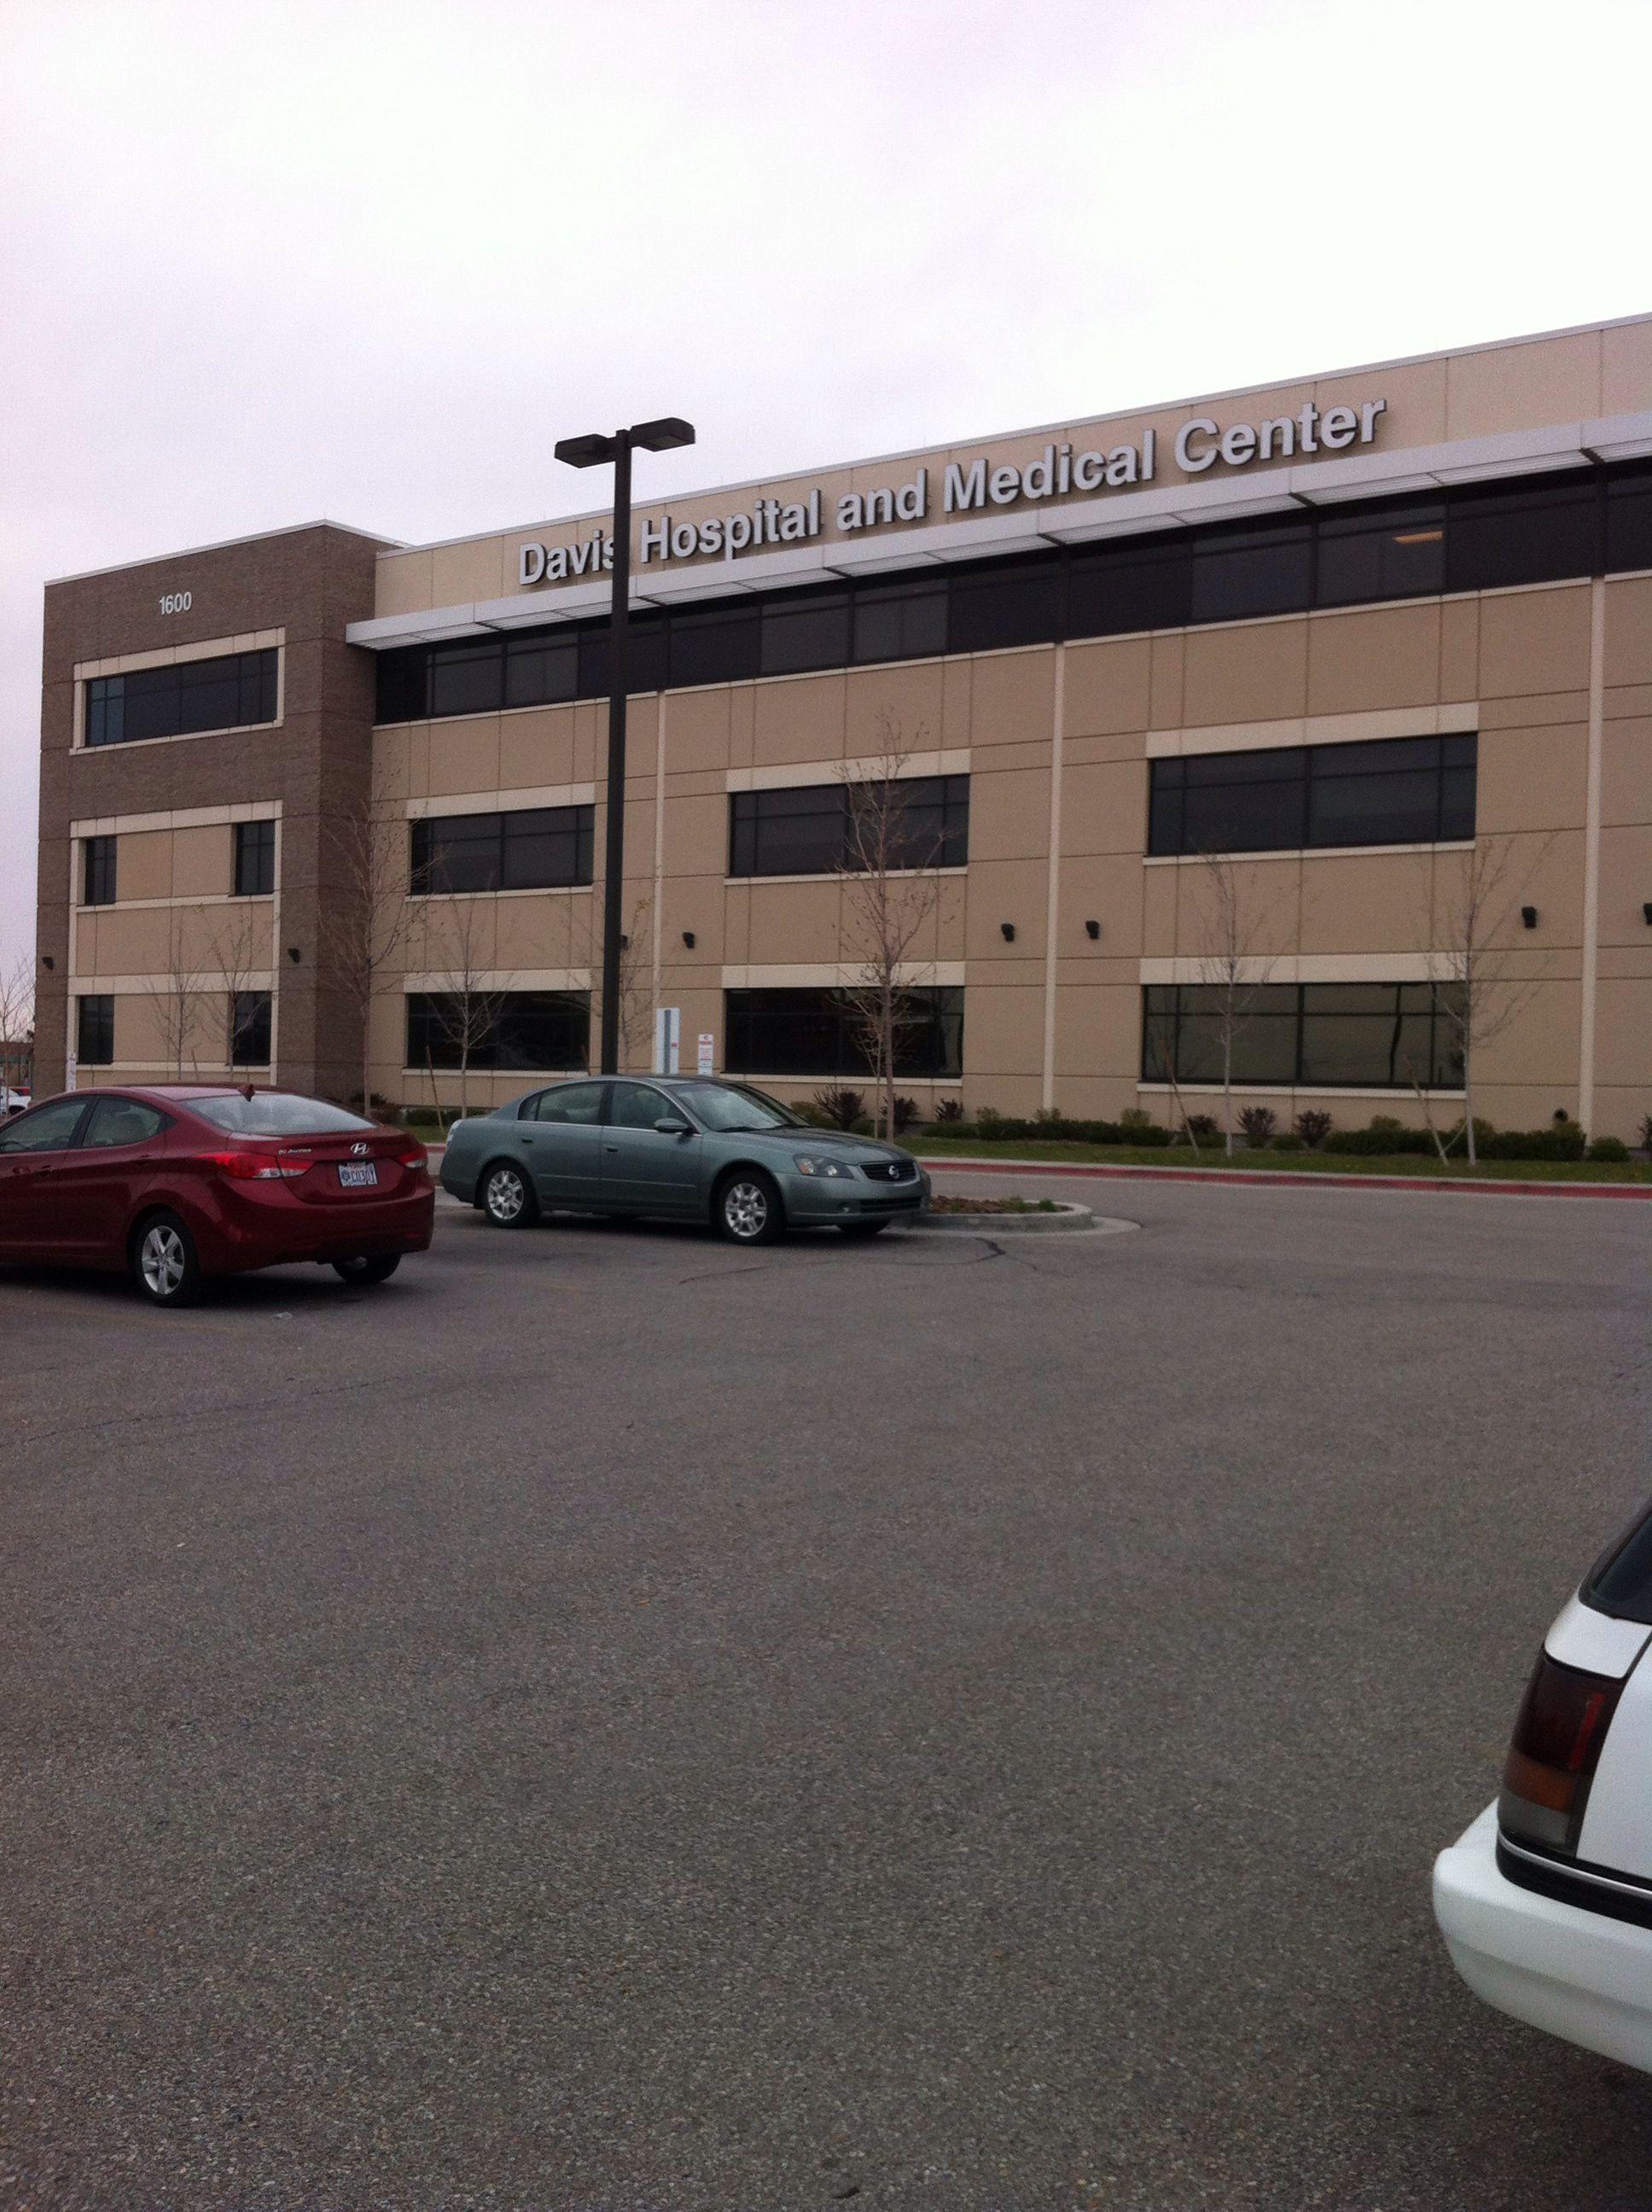 Davis Hospital Where my last daughter was born